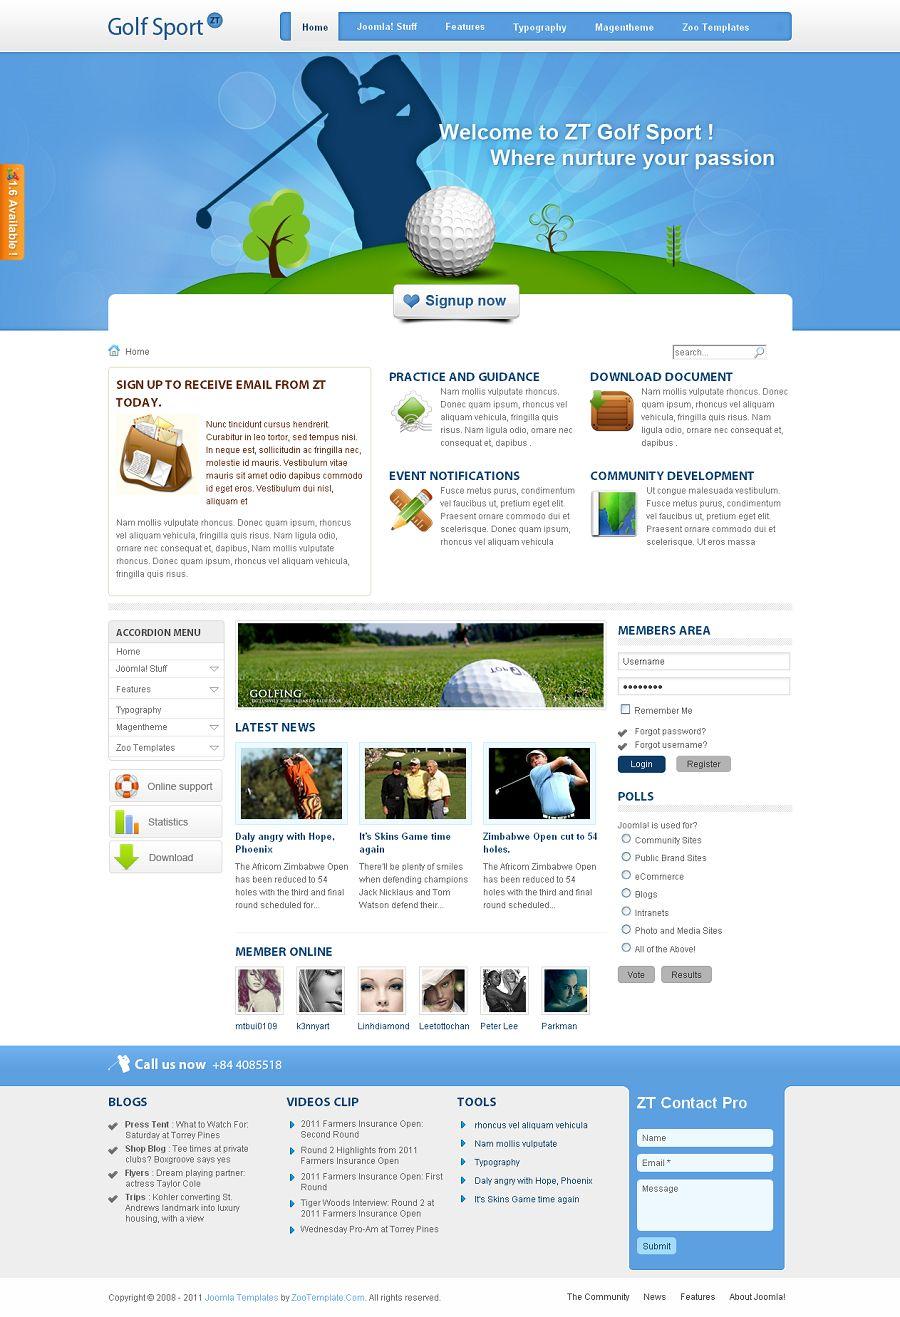 ZT GolfSport Premium Sports Template for Joomla 1.5 and 1.6